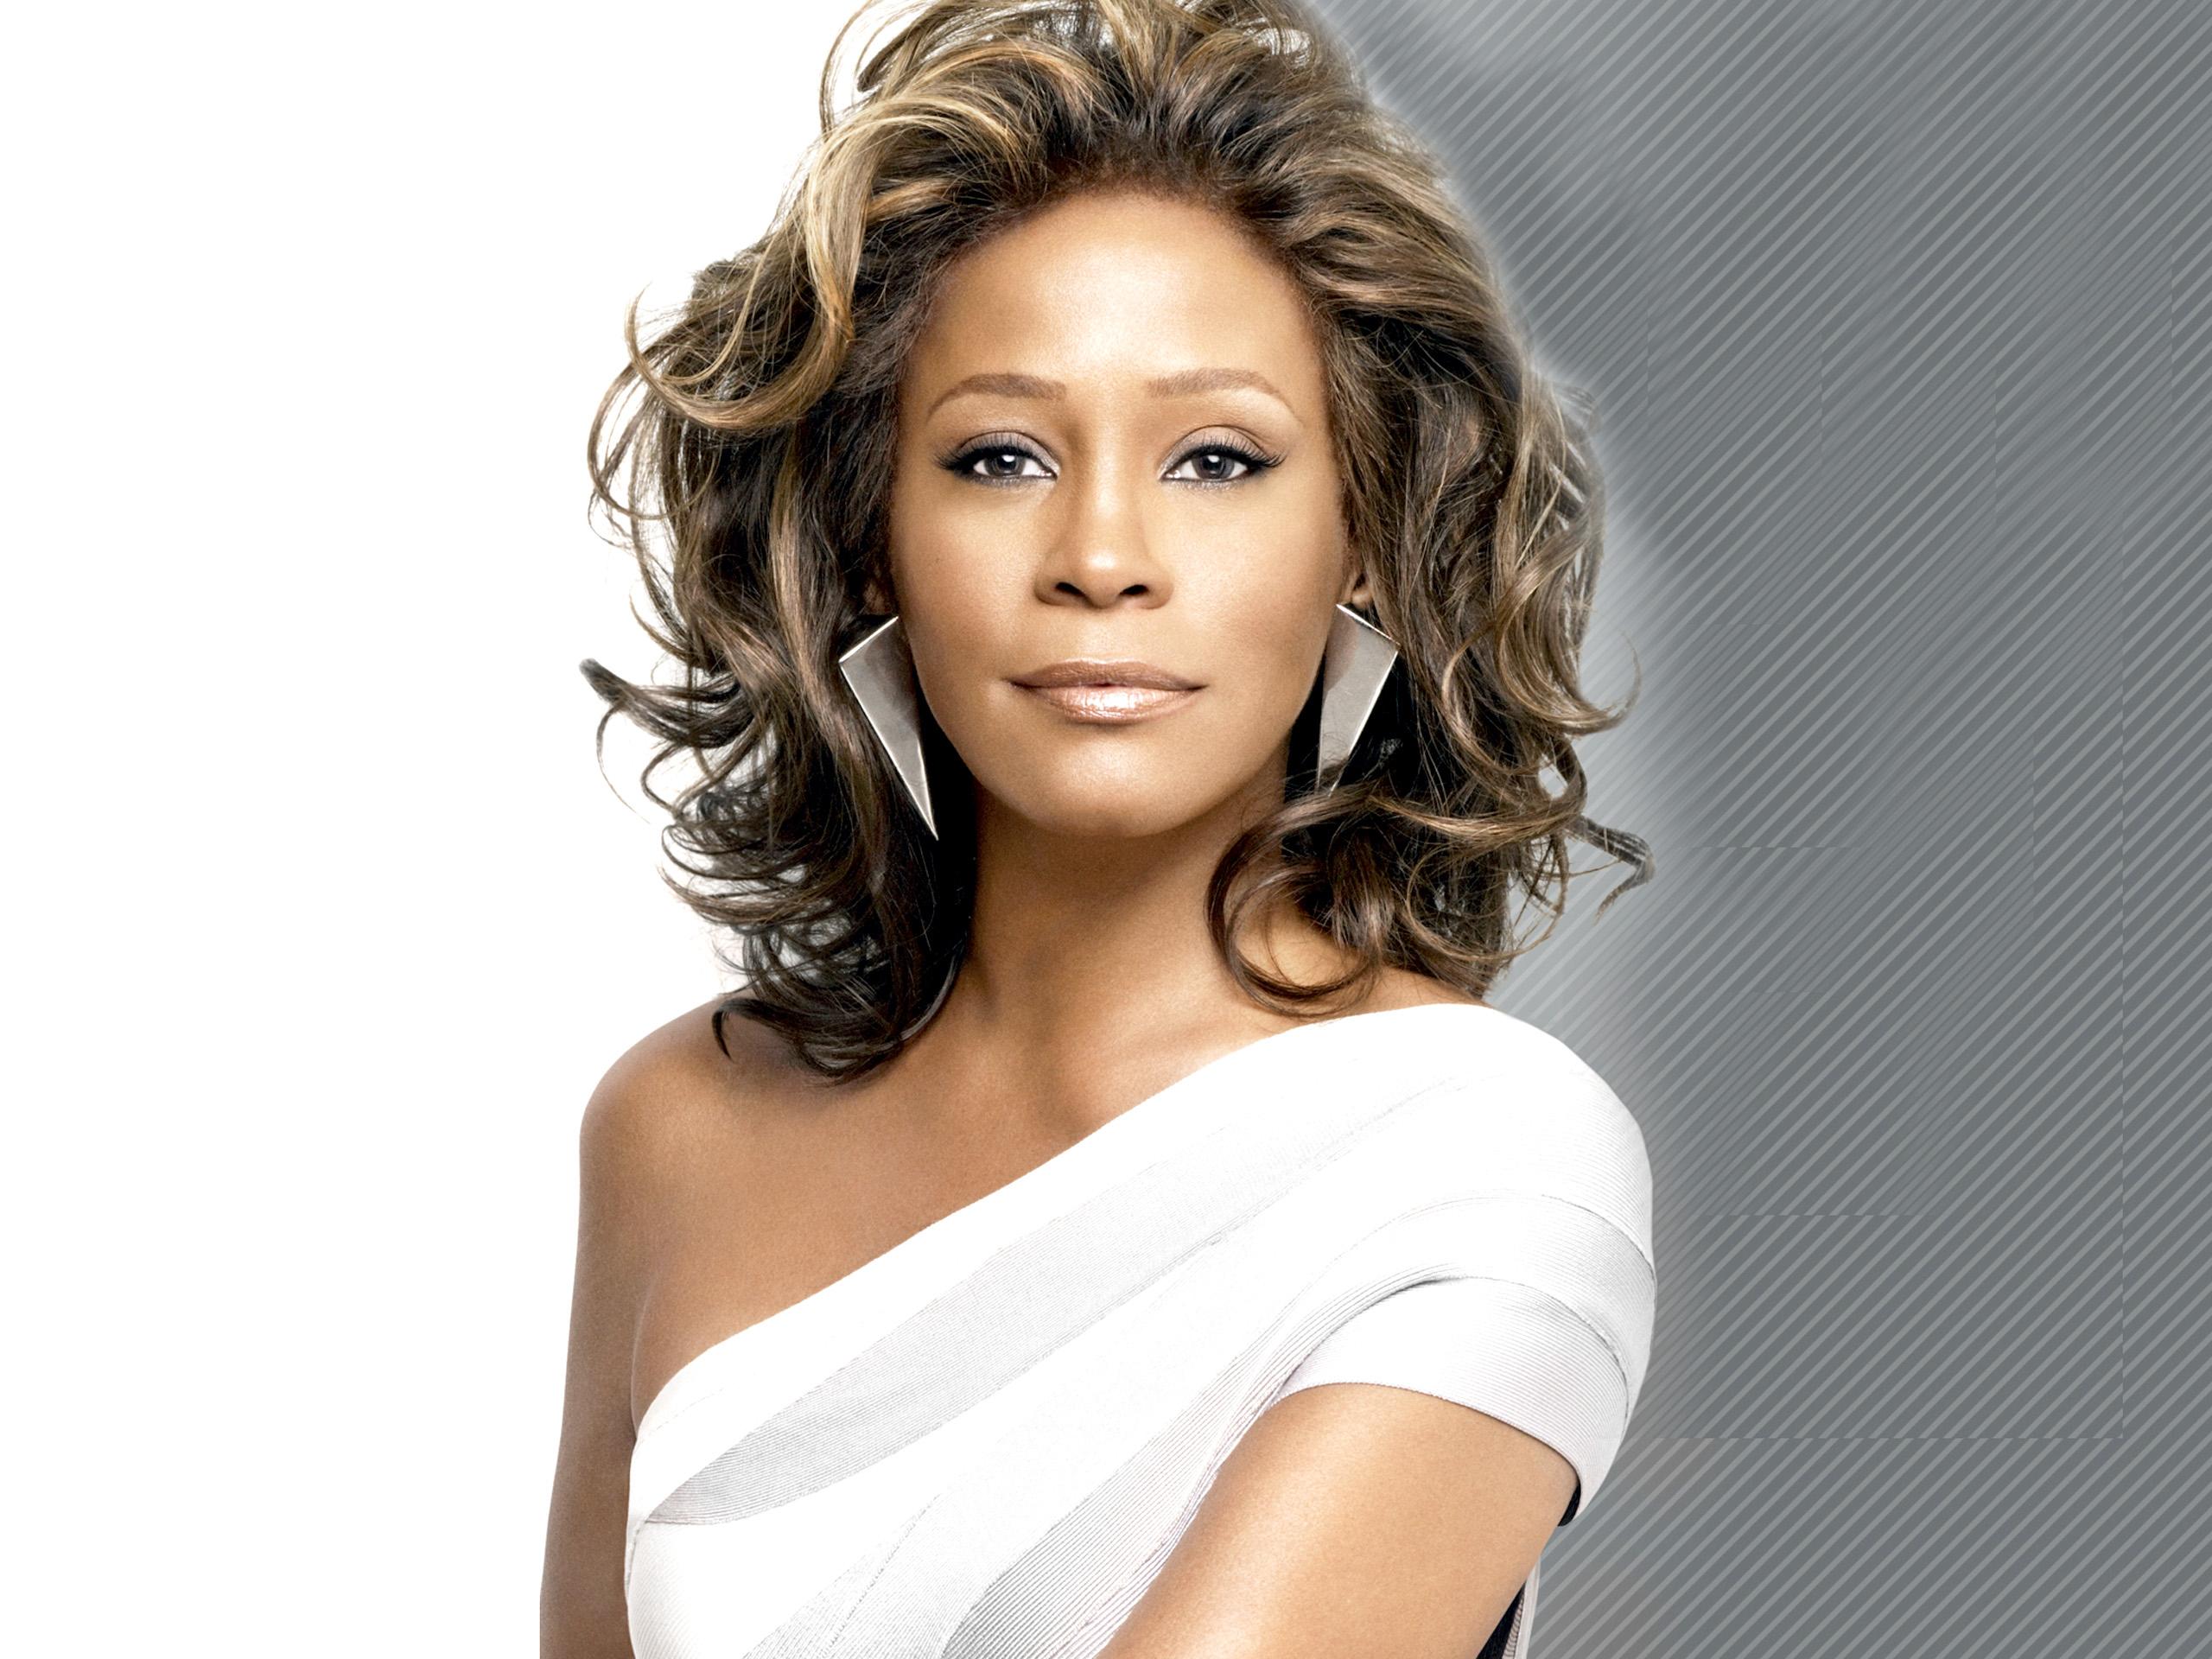 Singer Whitney Houston  - age: 48